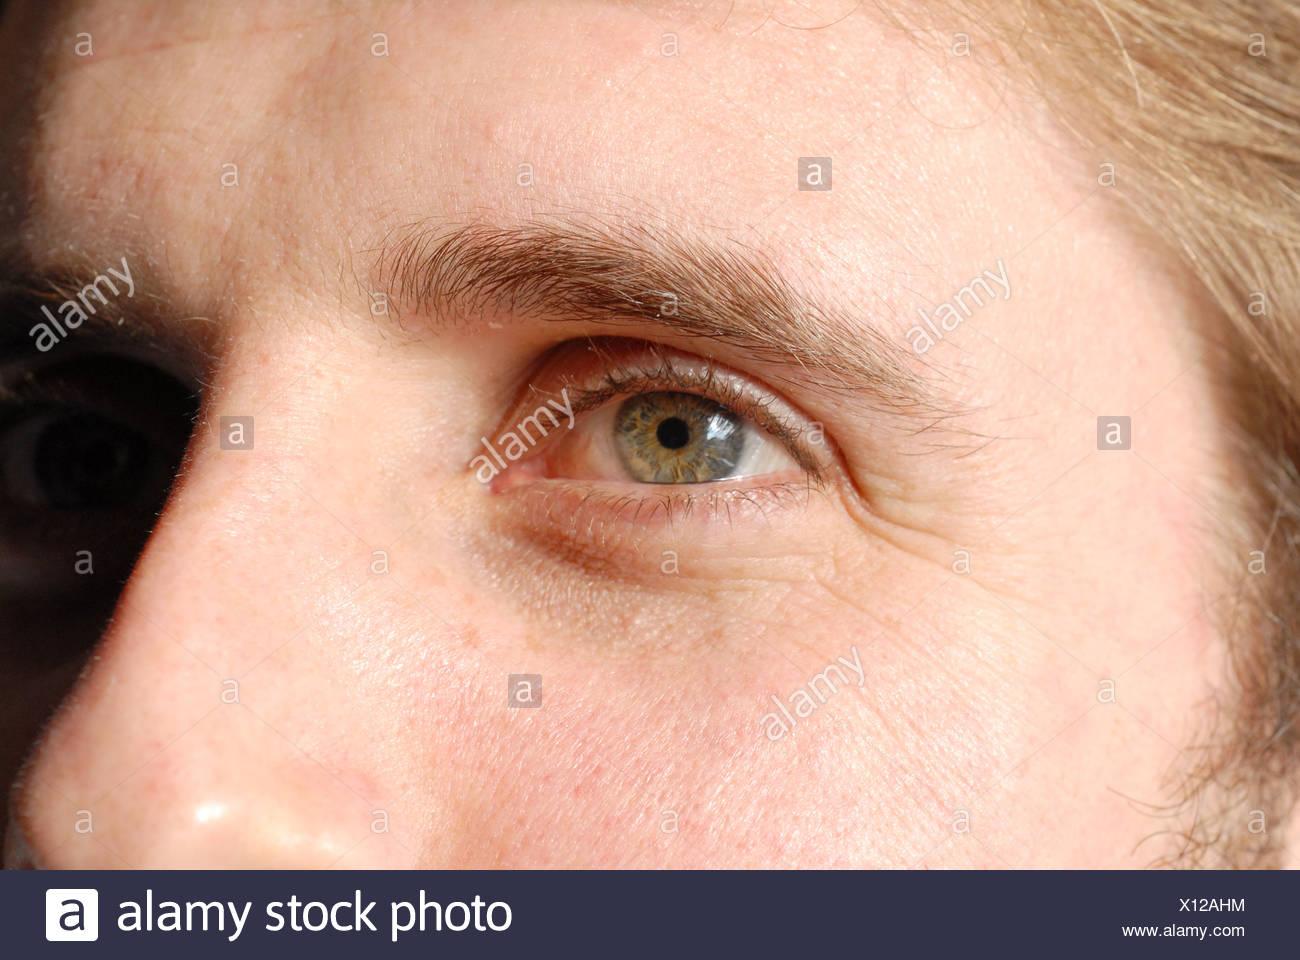 Close up image of male's eyeCharles Milligan Stock Photo